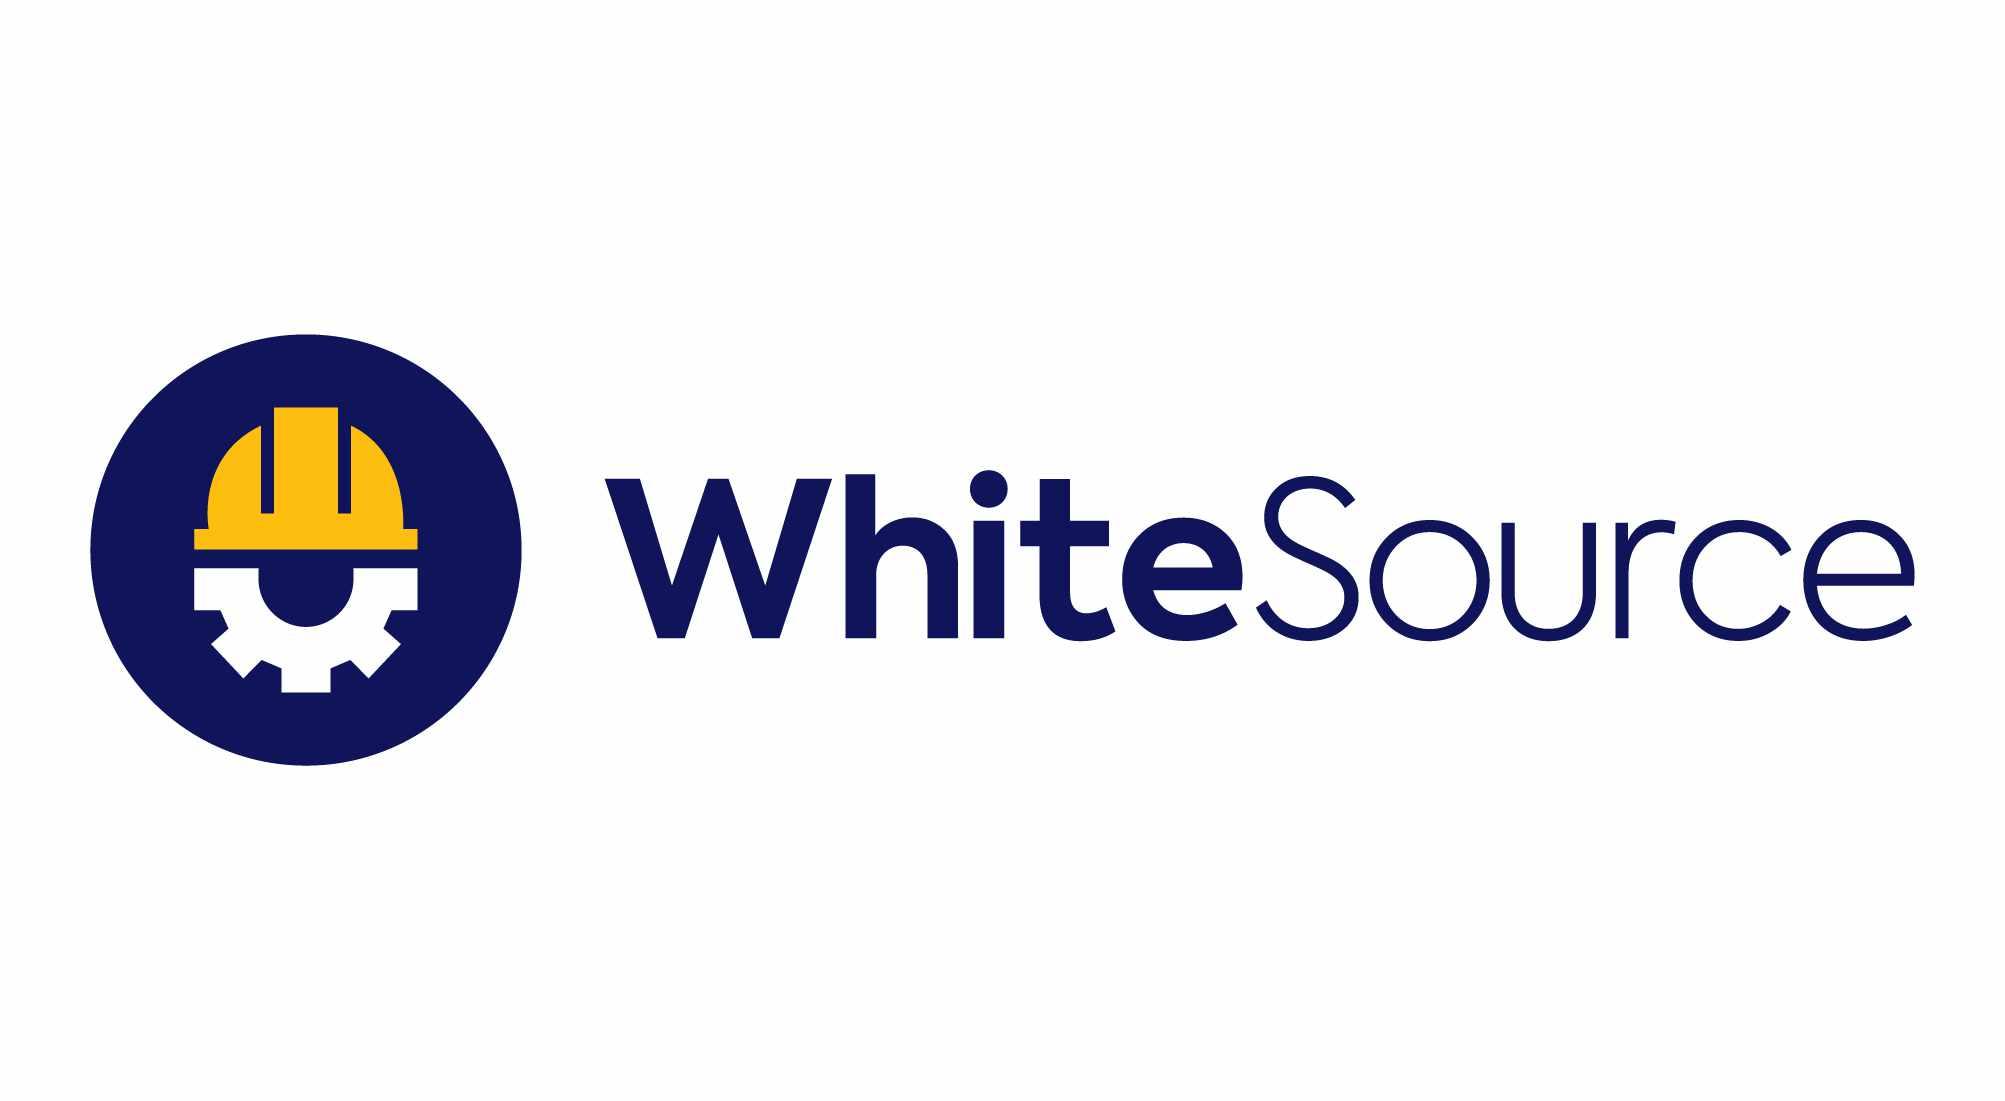 开源安全平台 WhiteSource 获 7500 万美元 D 轮融资